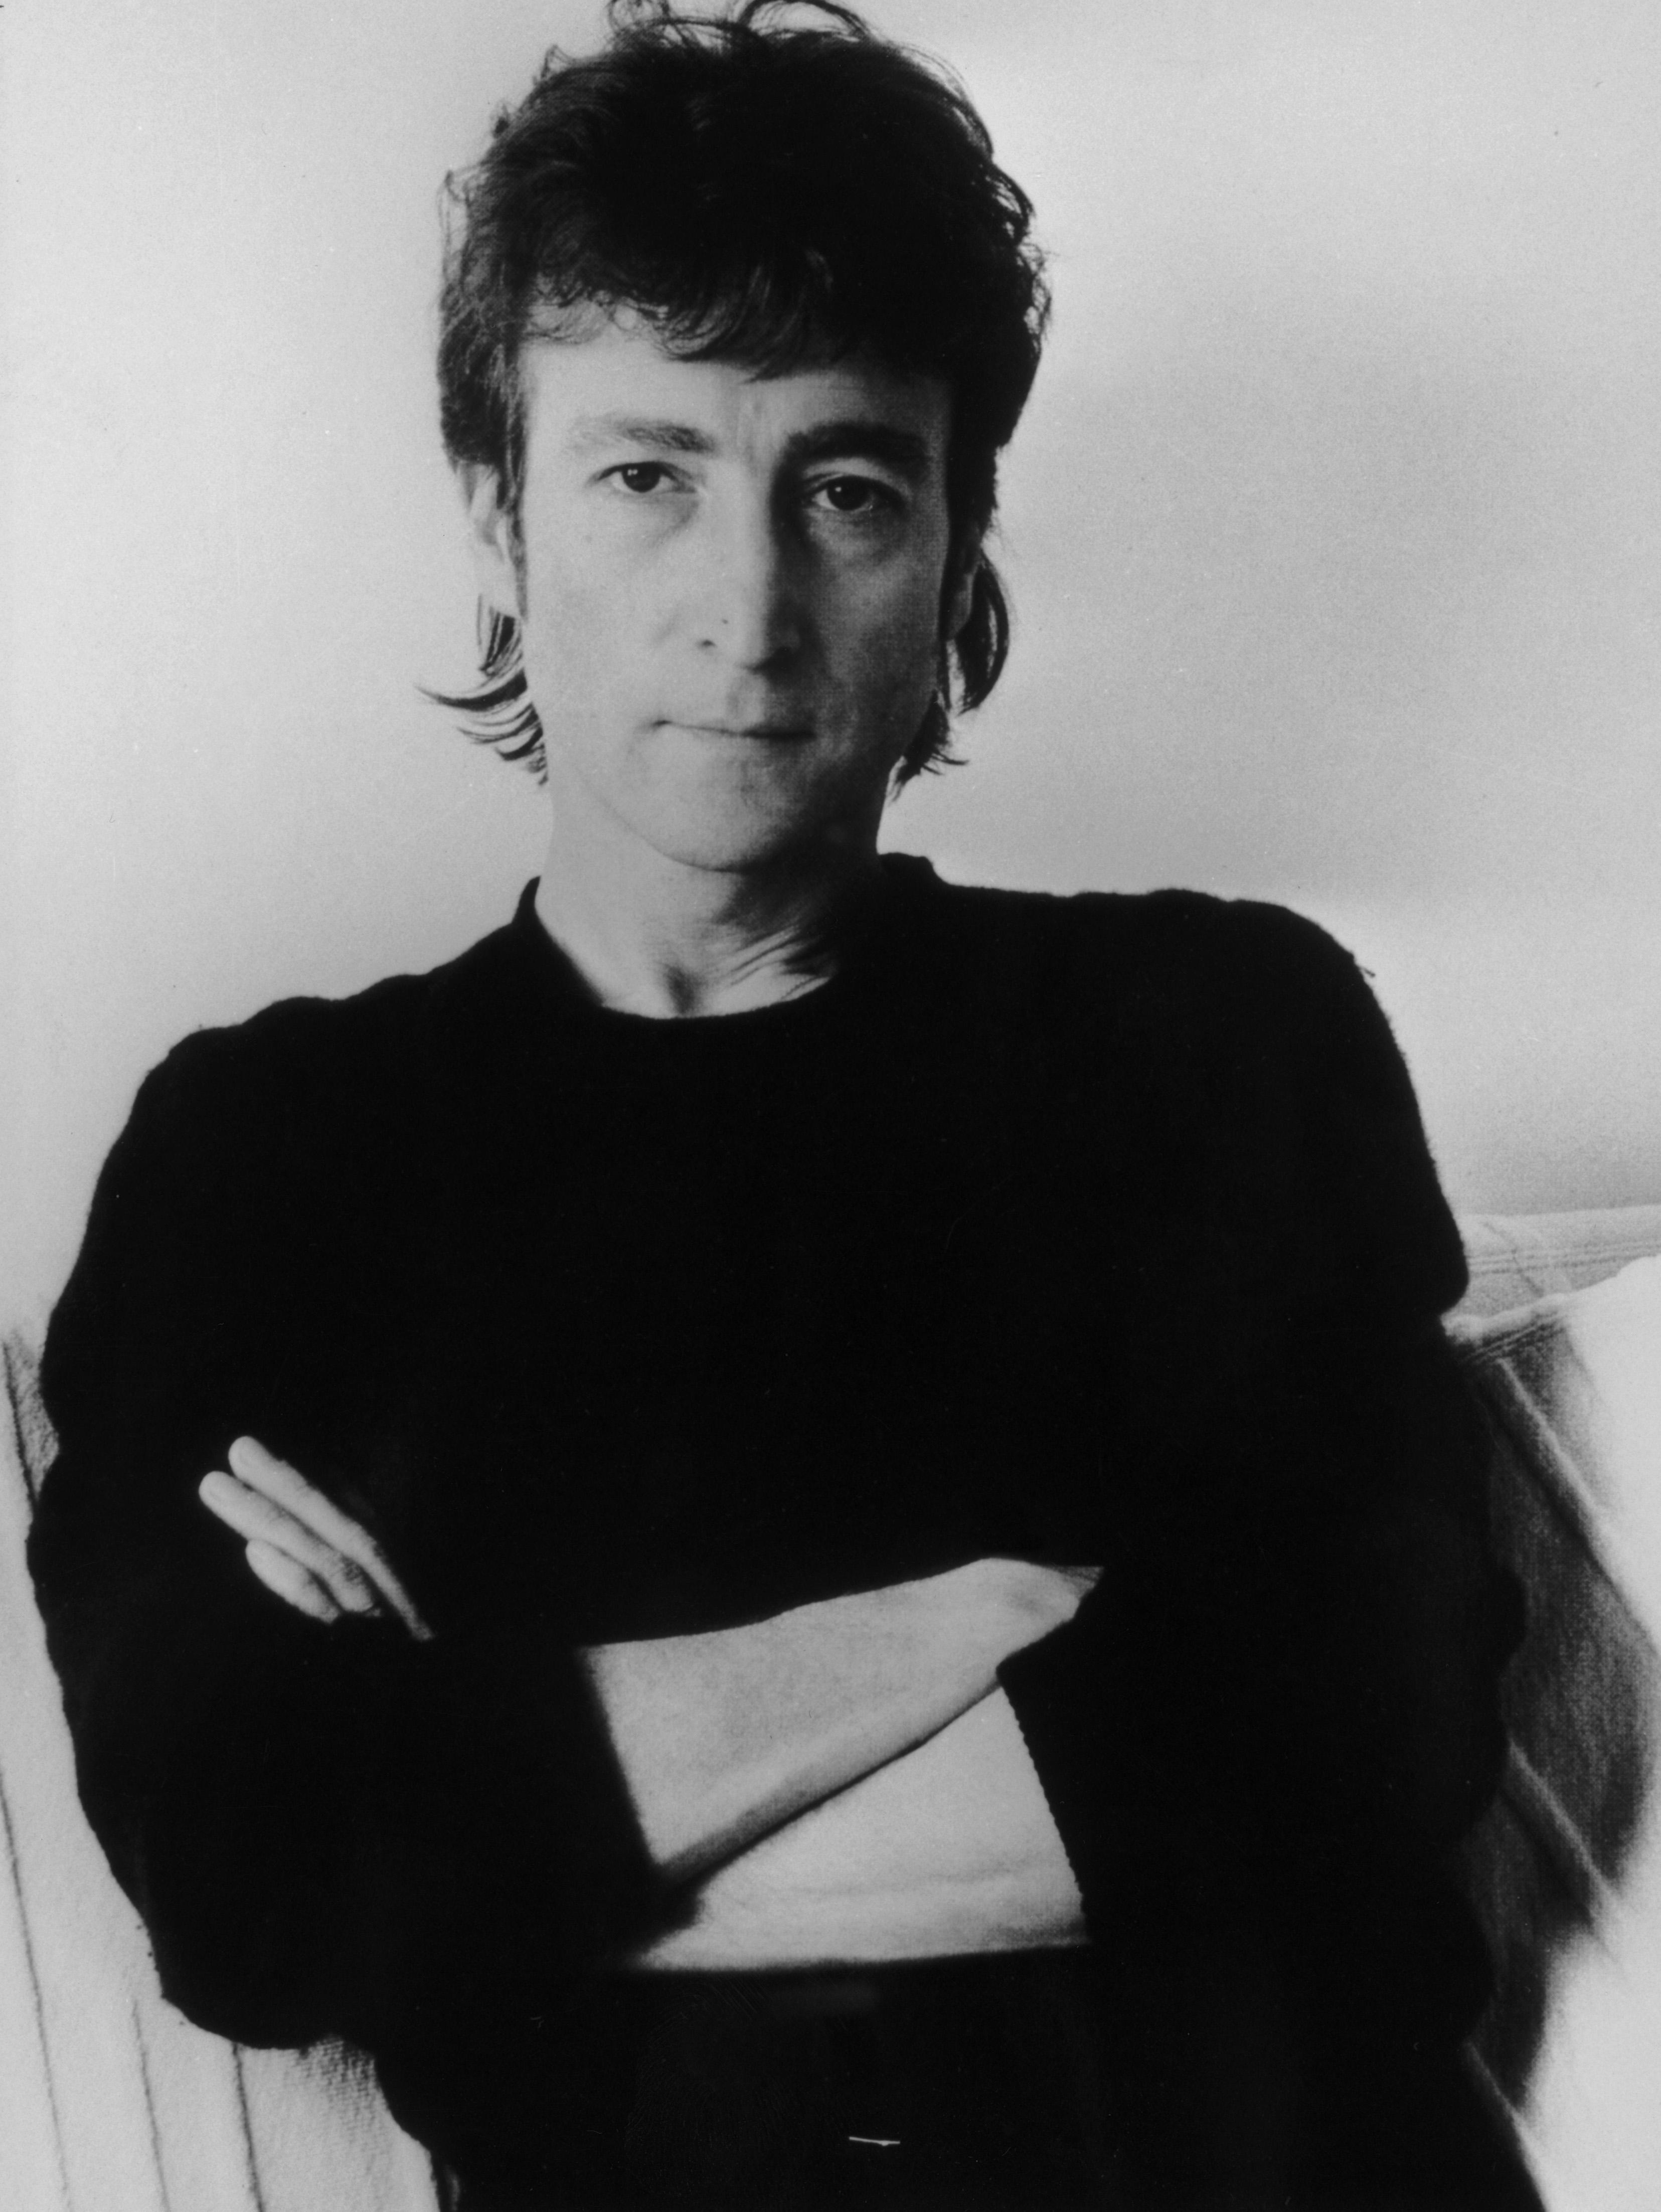 John Lennon Wallpapers High Quality | Download Free  John Lennon Wal...